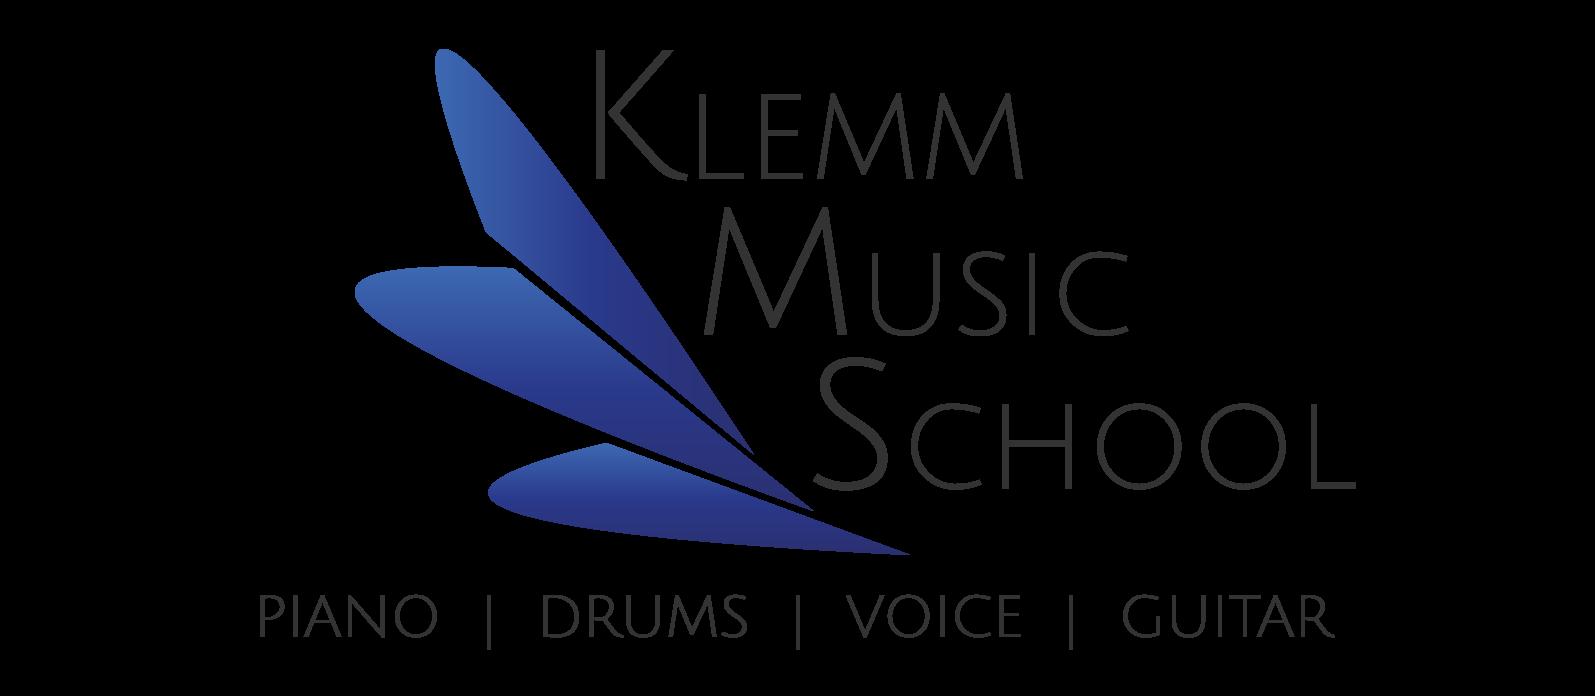 KlemmMusicSchool---Tagline.png